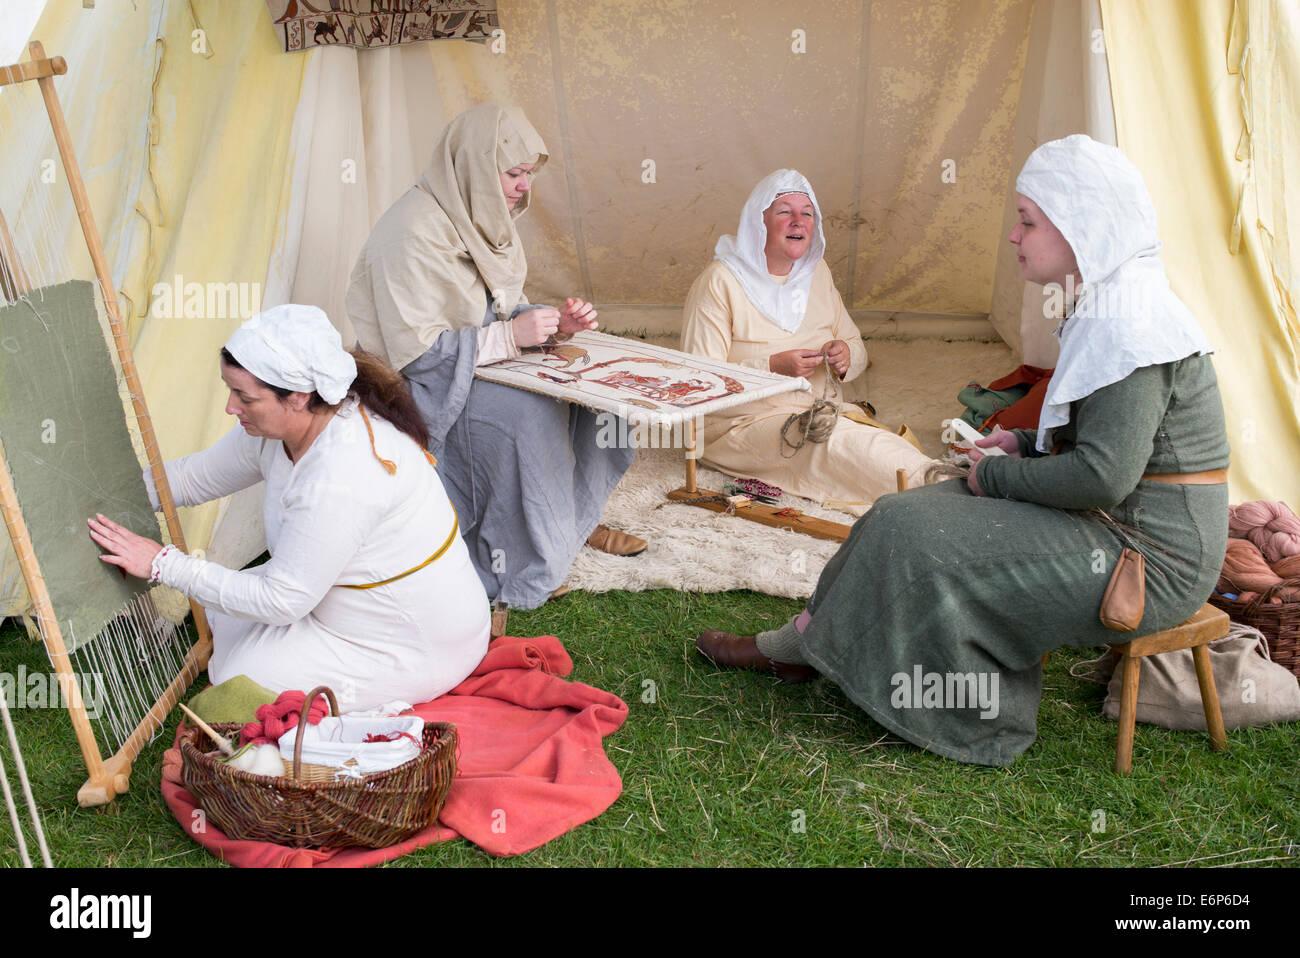 Viking women making Tapestries at a historical reenactment. UK - Stock Image